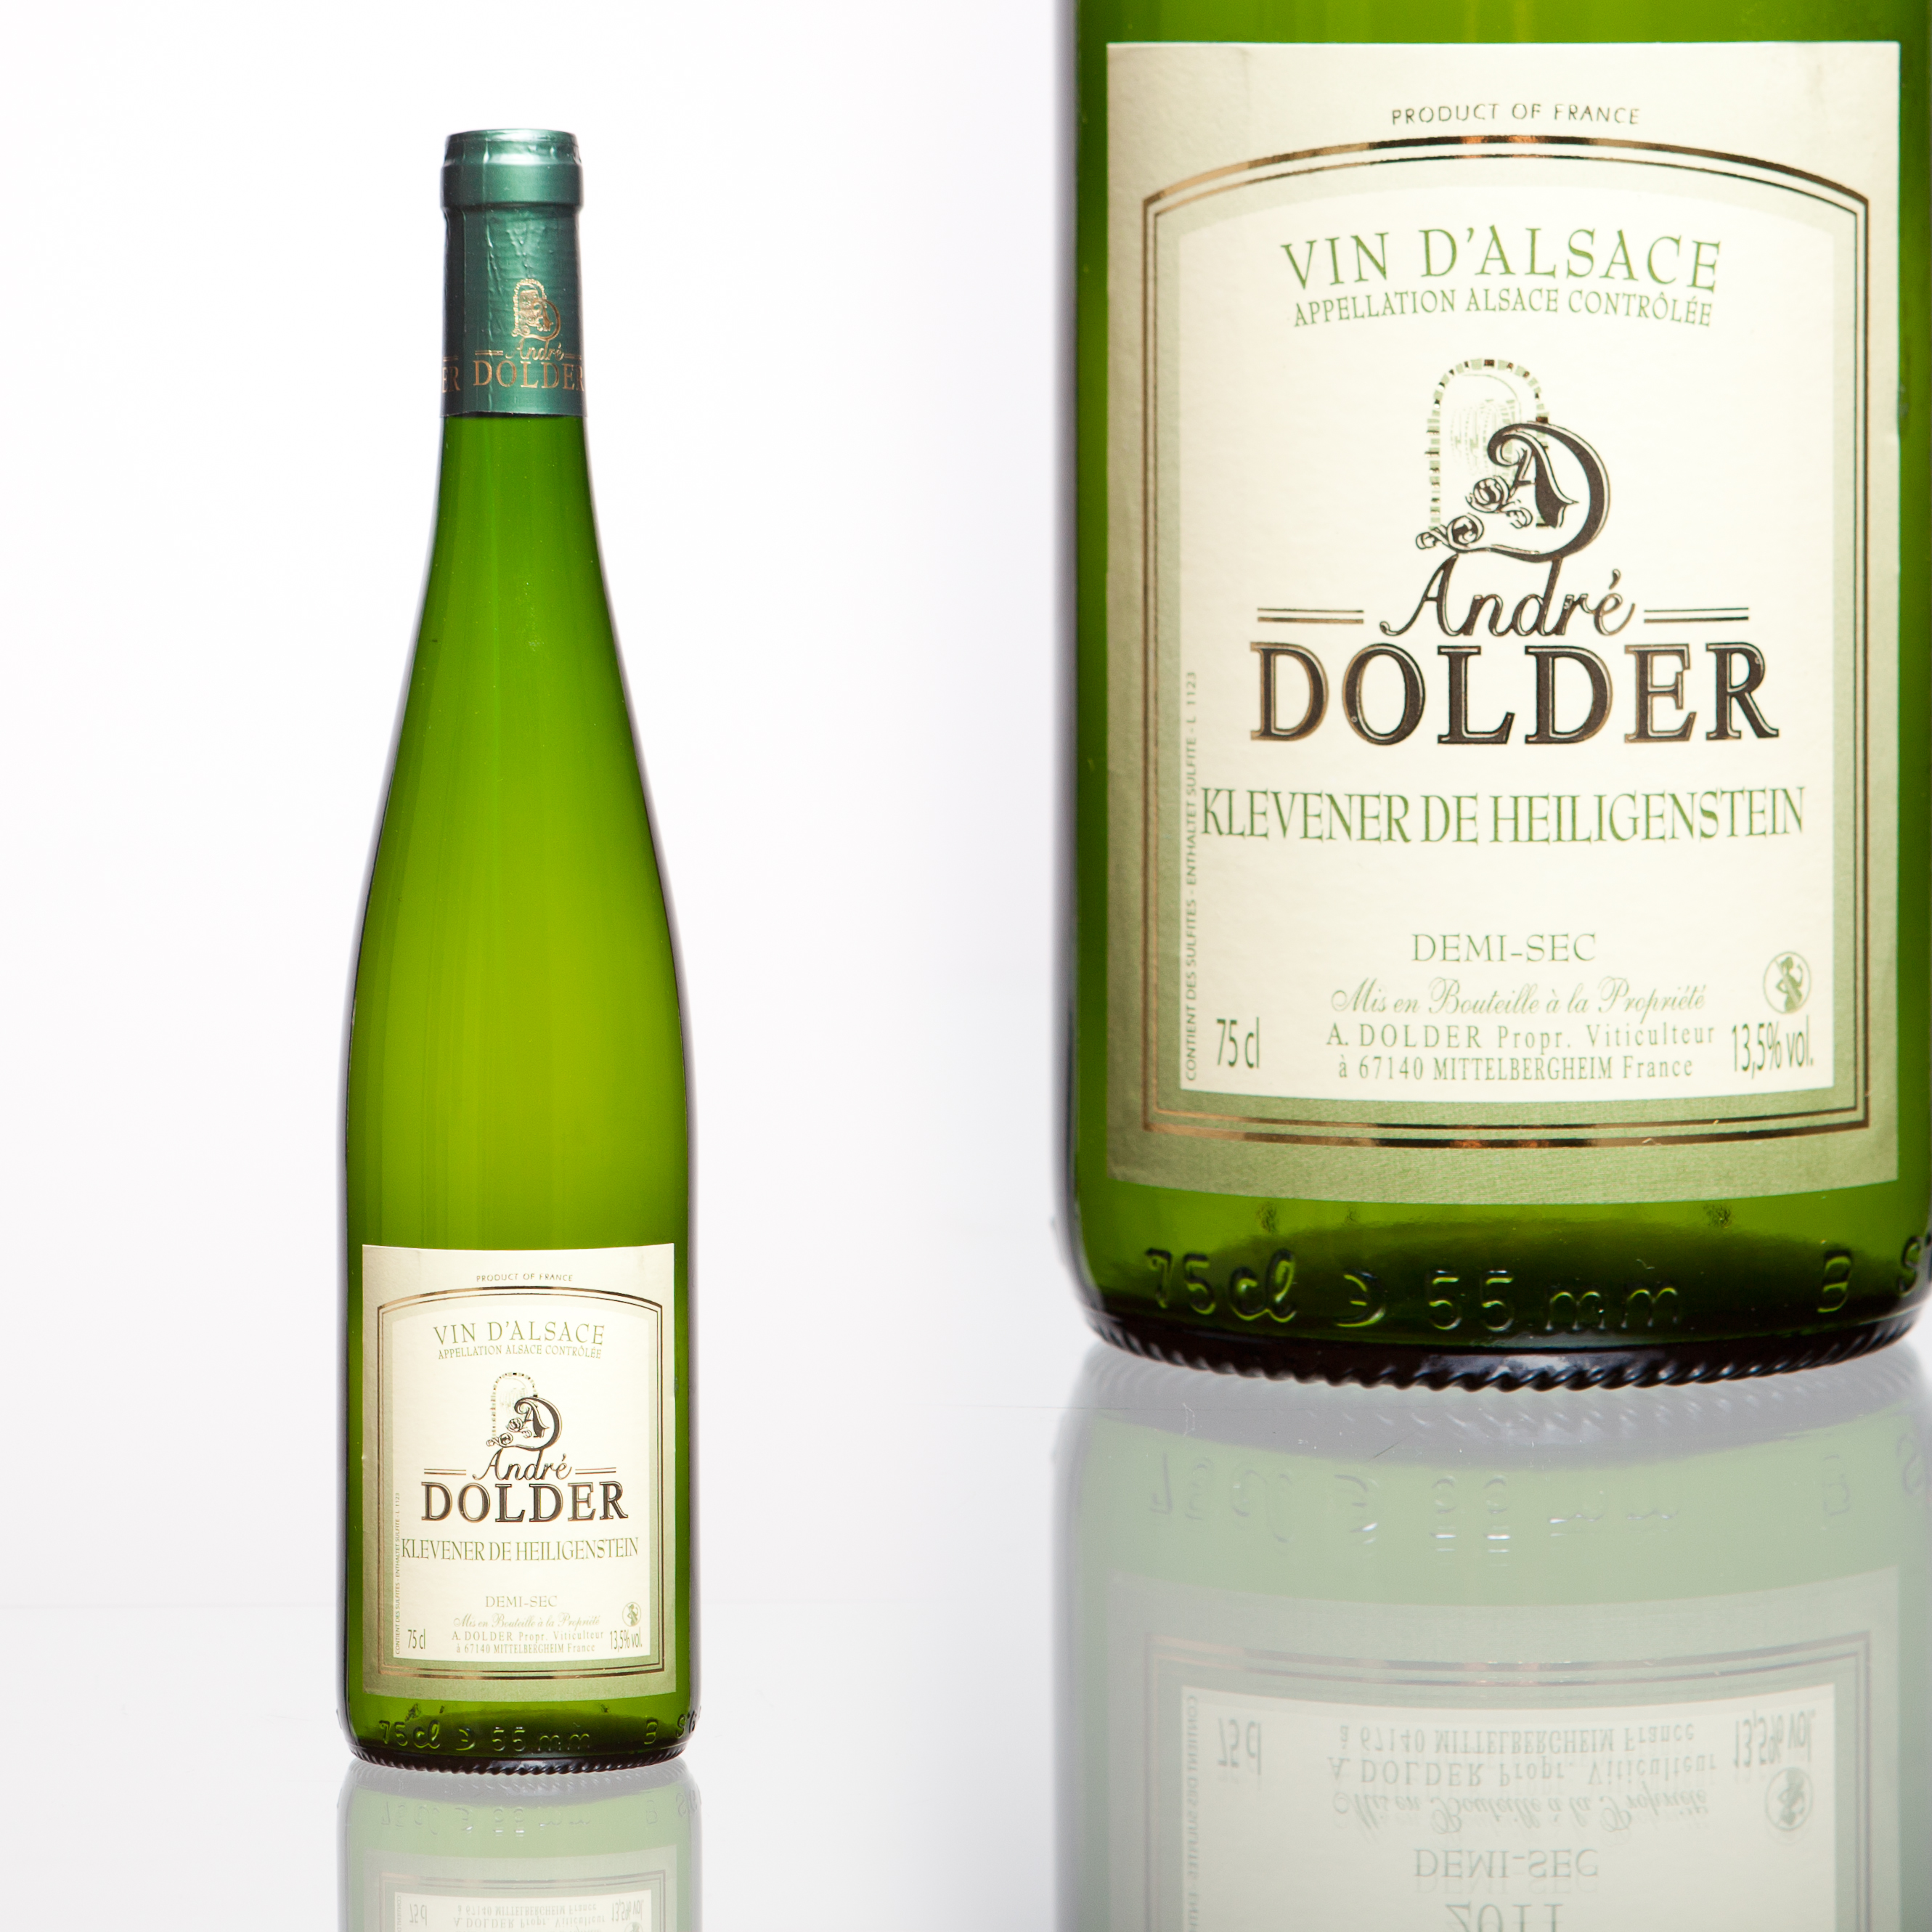 Klevener de Heiligenstein Vins et Crémant d'Alsace André Dolder